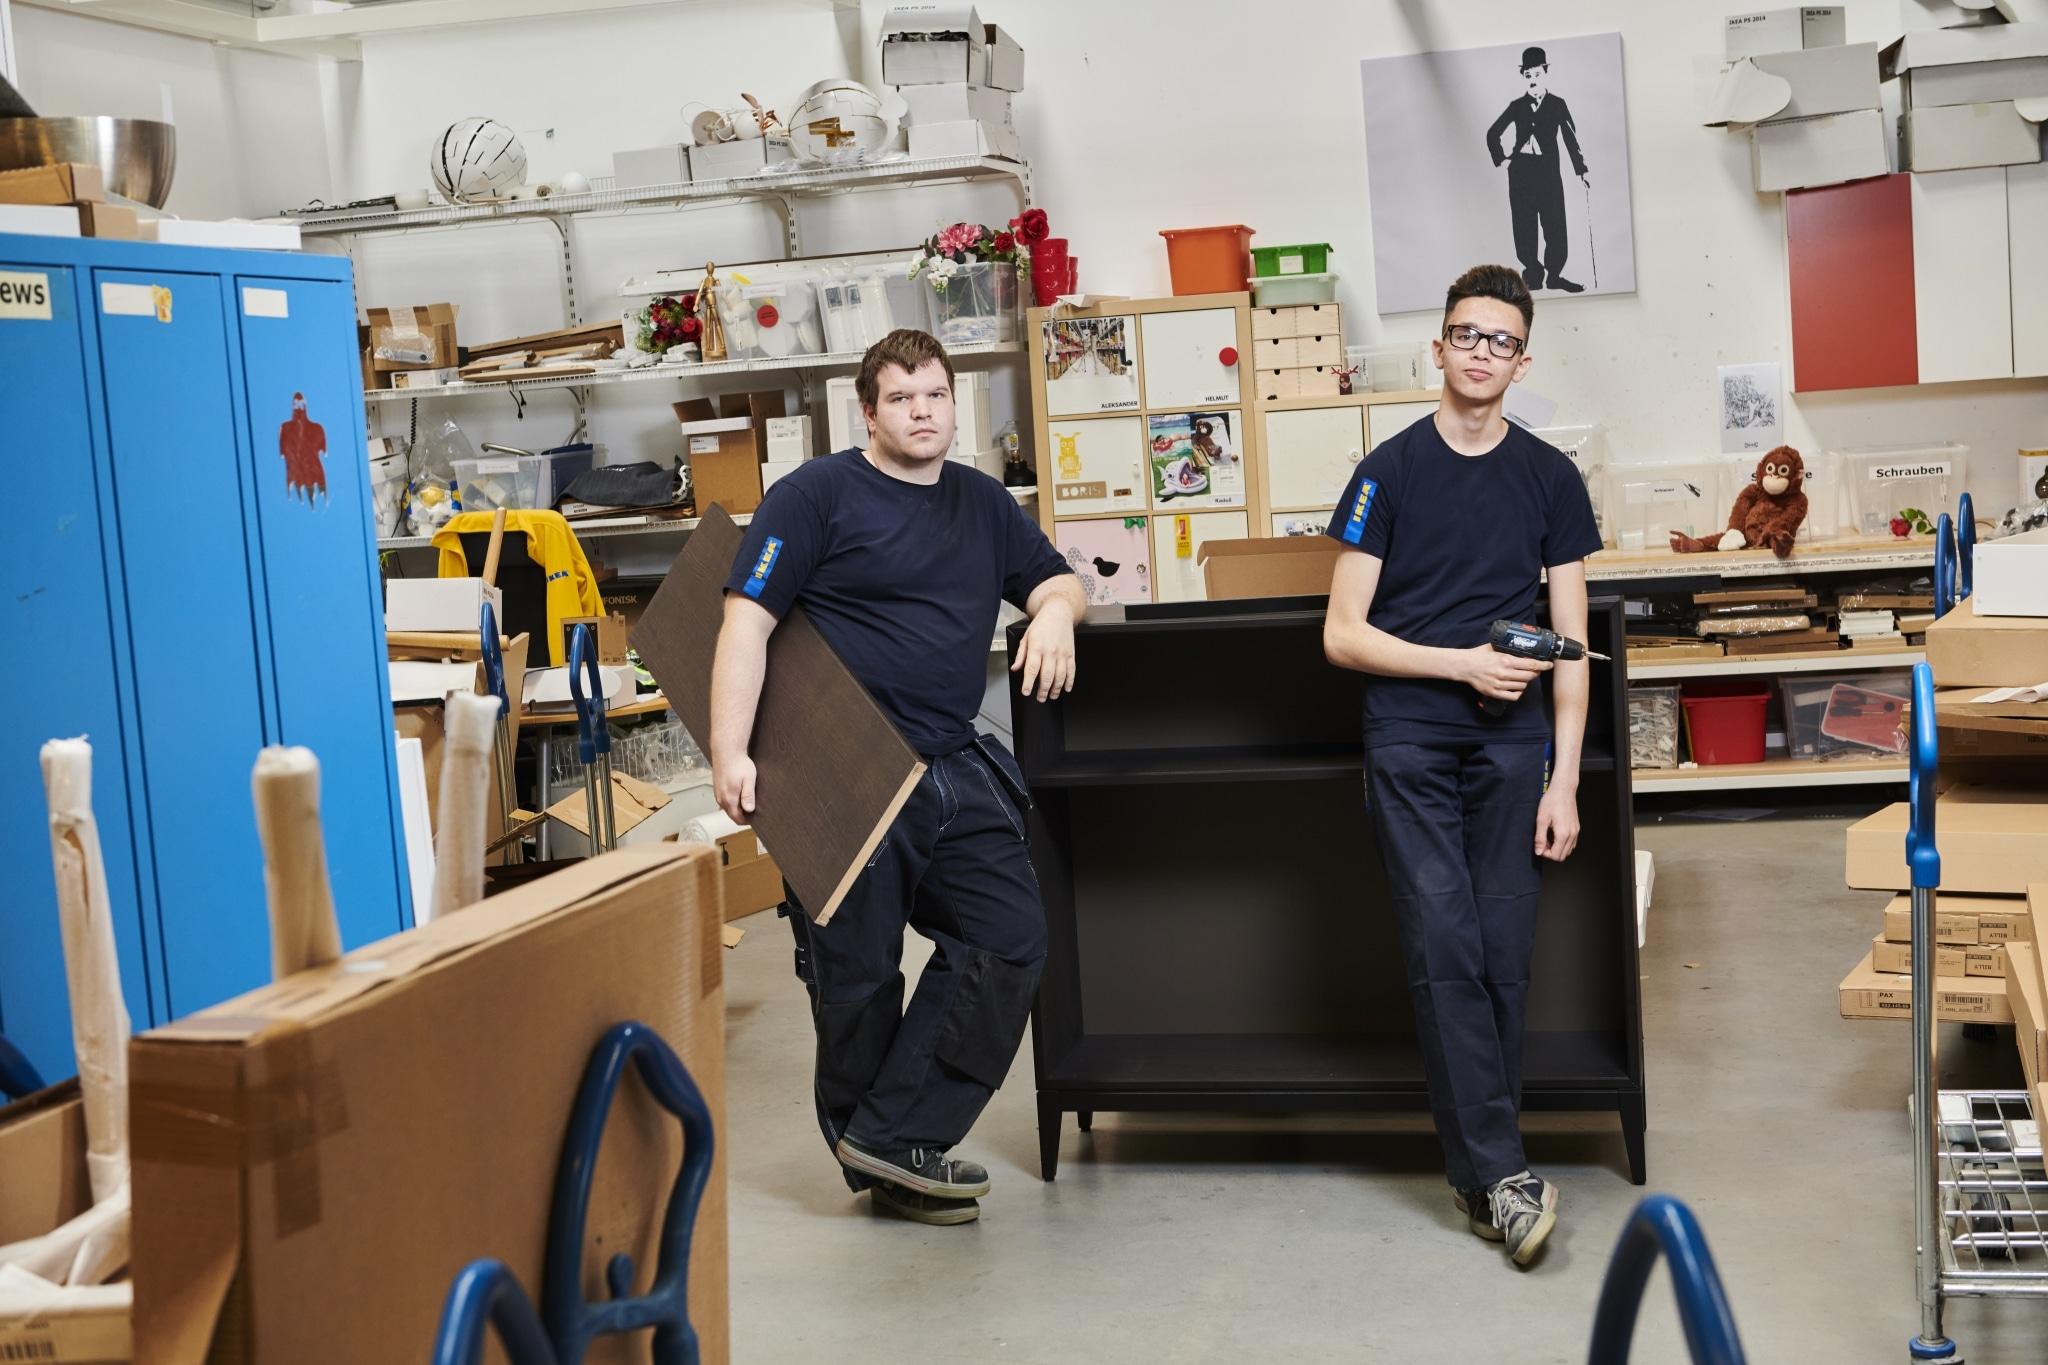 Arbeitsgruppe im IKEA-Lager